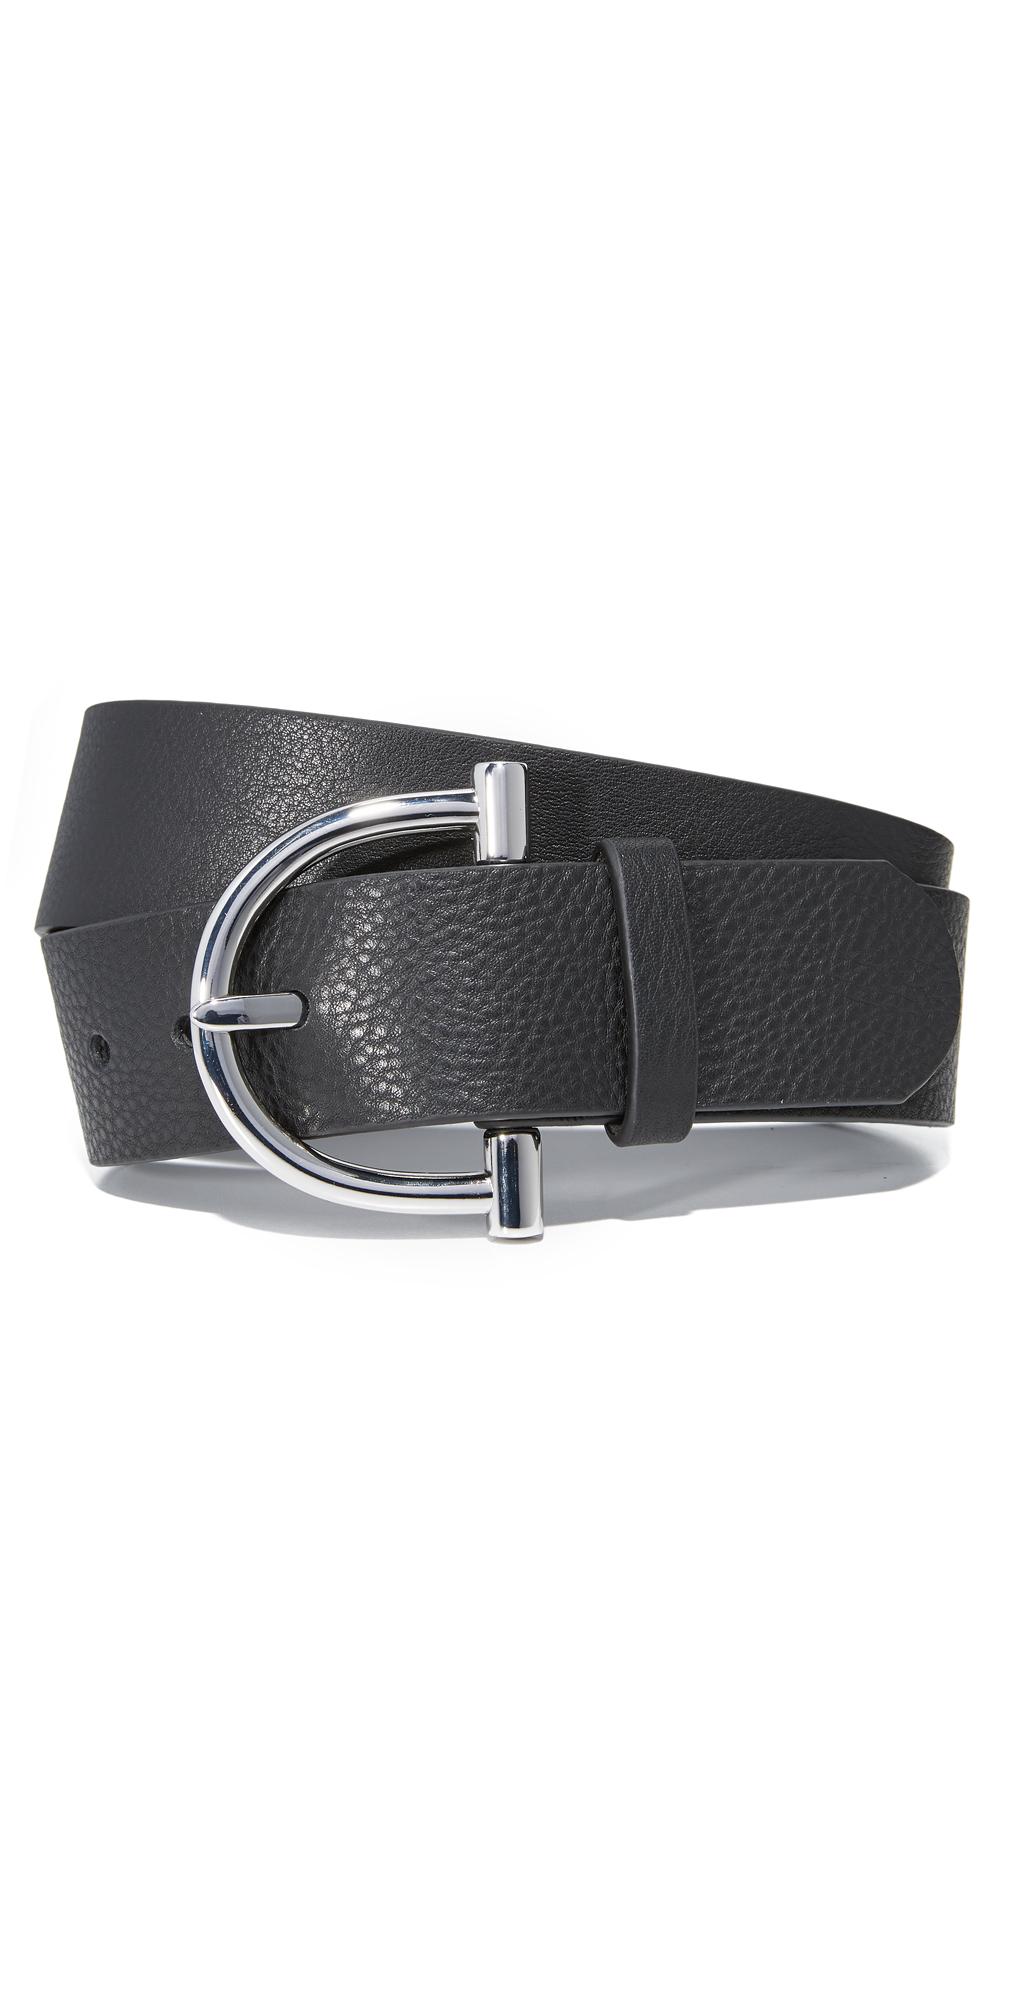 Blake Belt B-Low The Belt